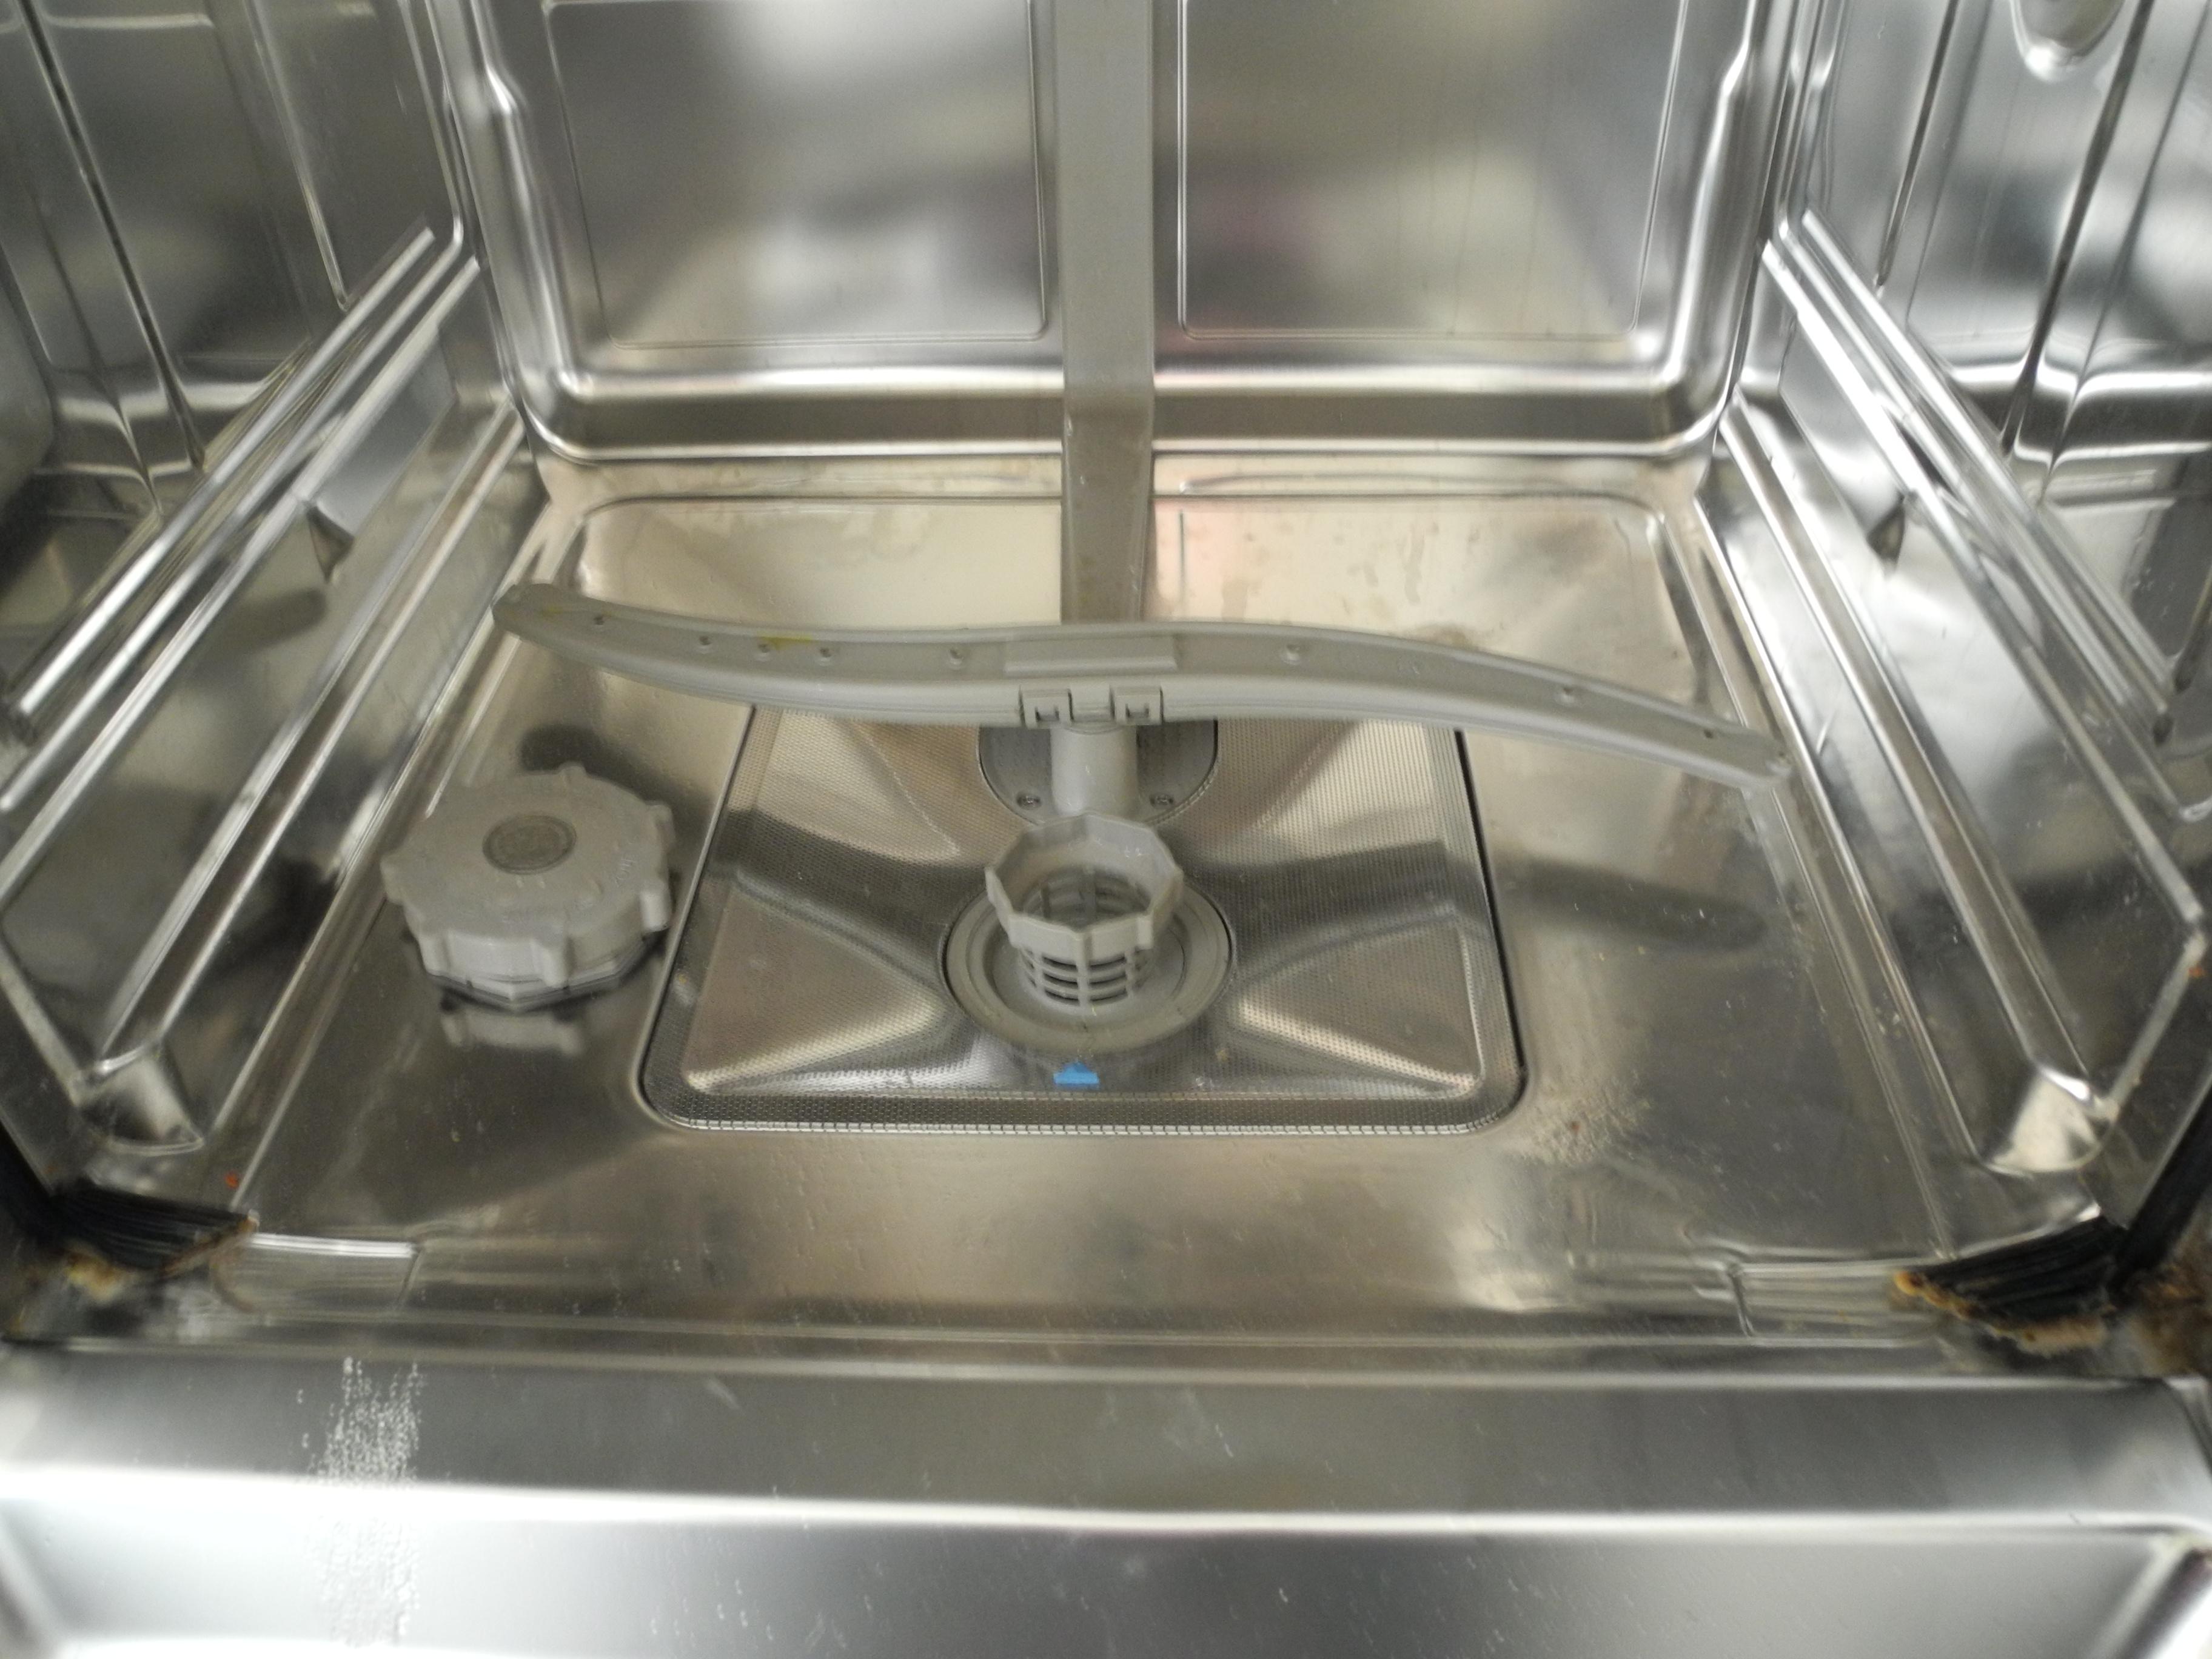 Hqdefault additionally Siemens Diswasher Impeller Jug moreover Xs also Bosch Dishwasher Water Valve besides Photo Mar Am. on bosch dishwasher float switch